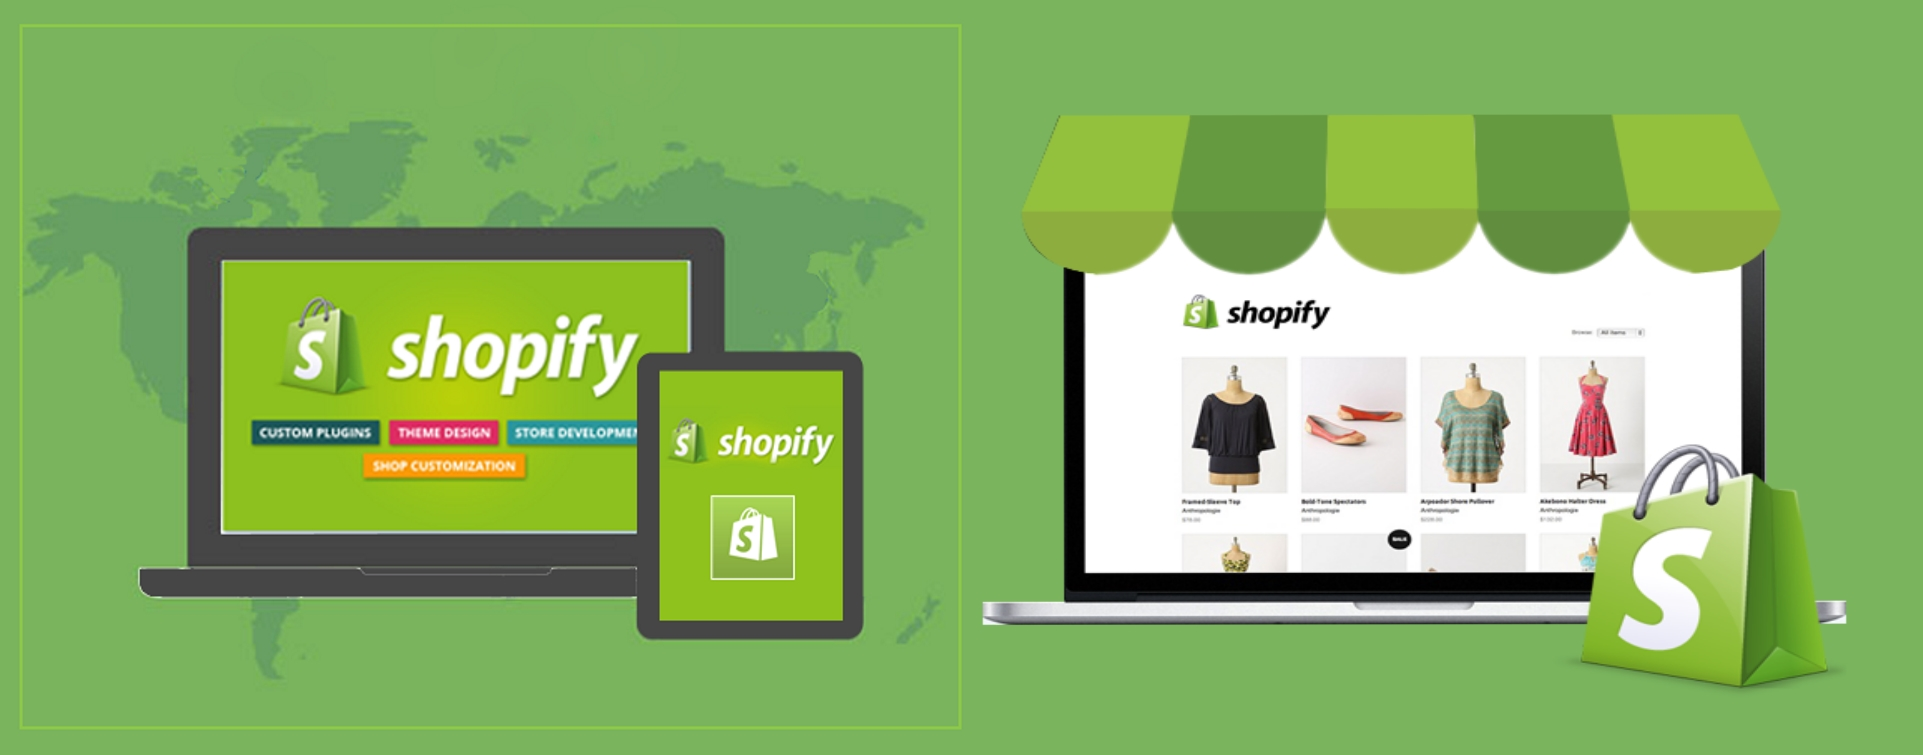 shopify_banner